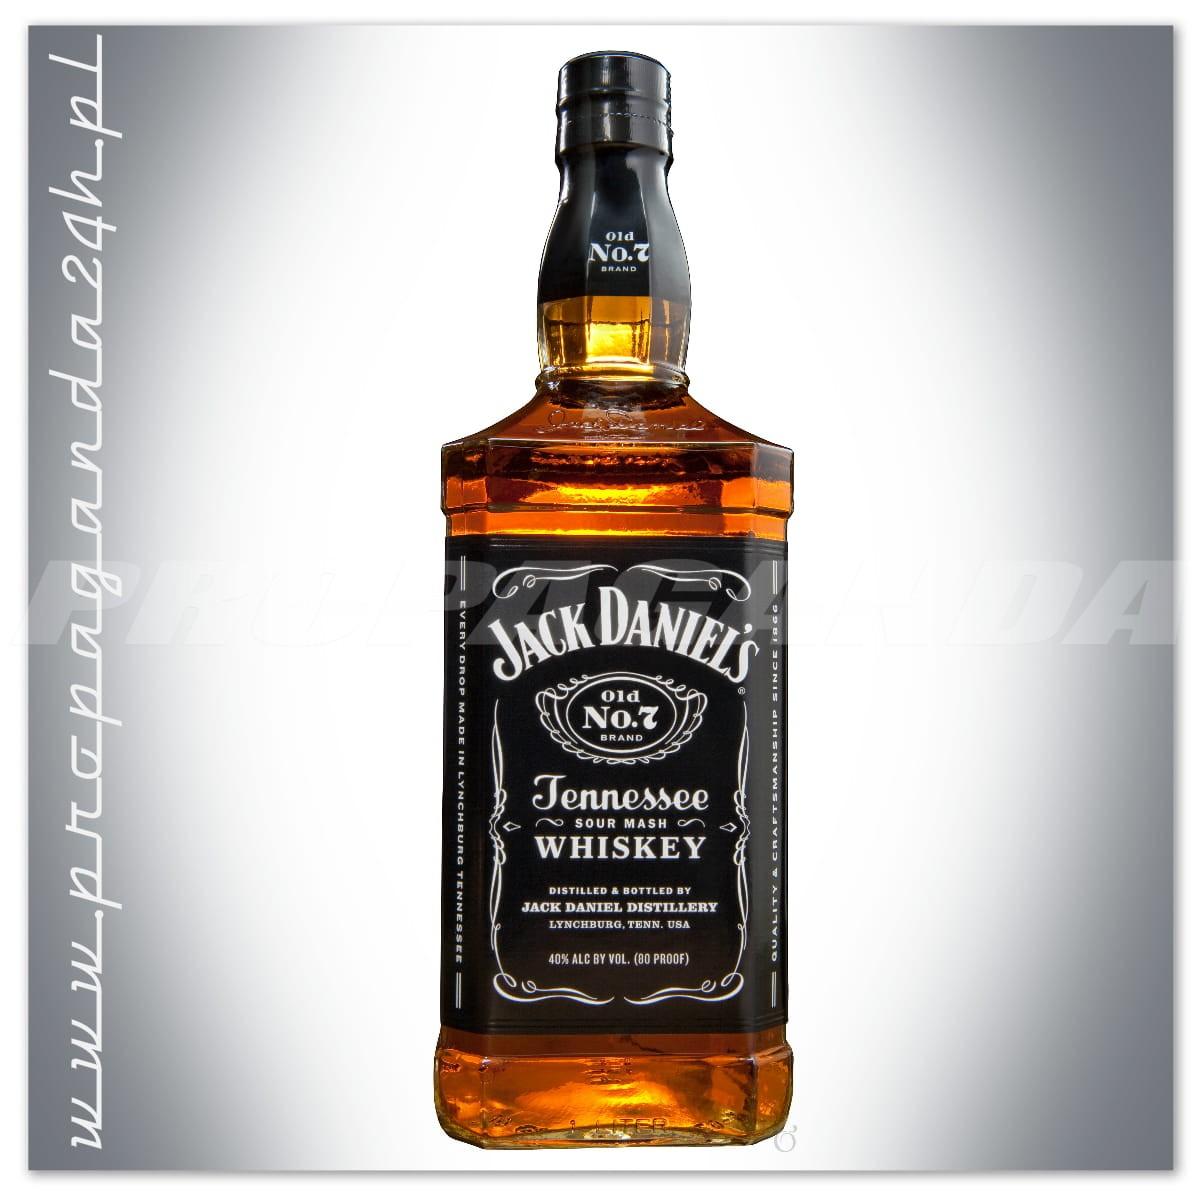 Jack black meets shinee